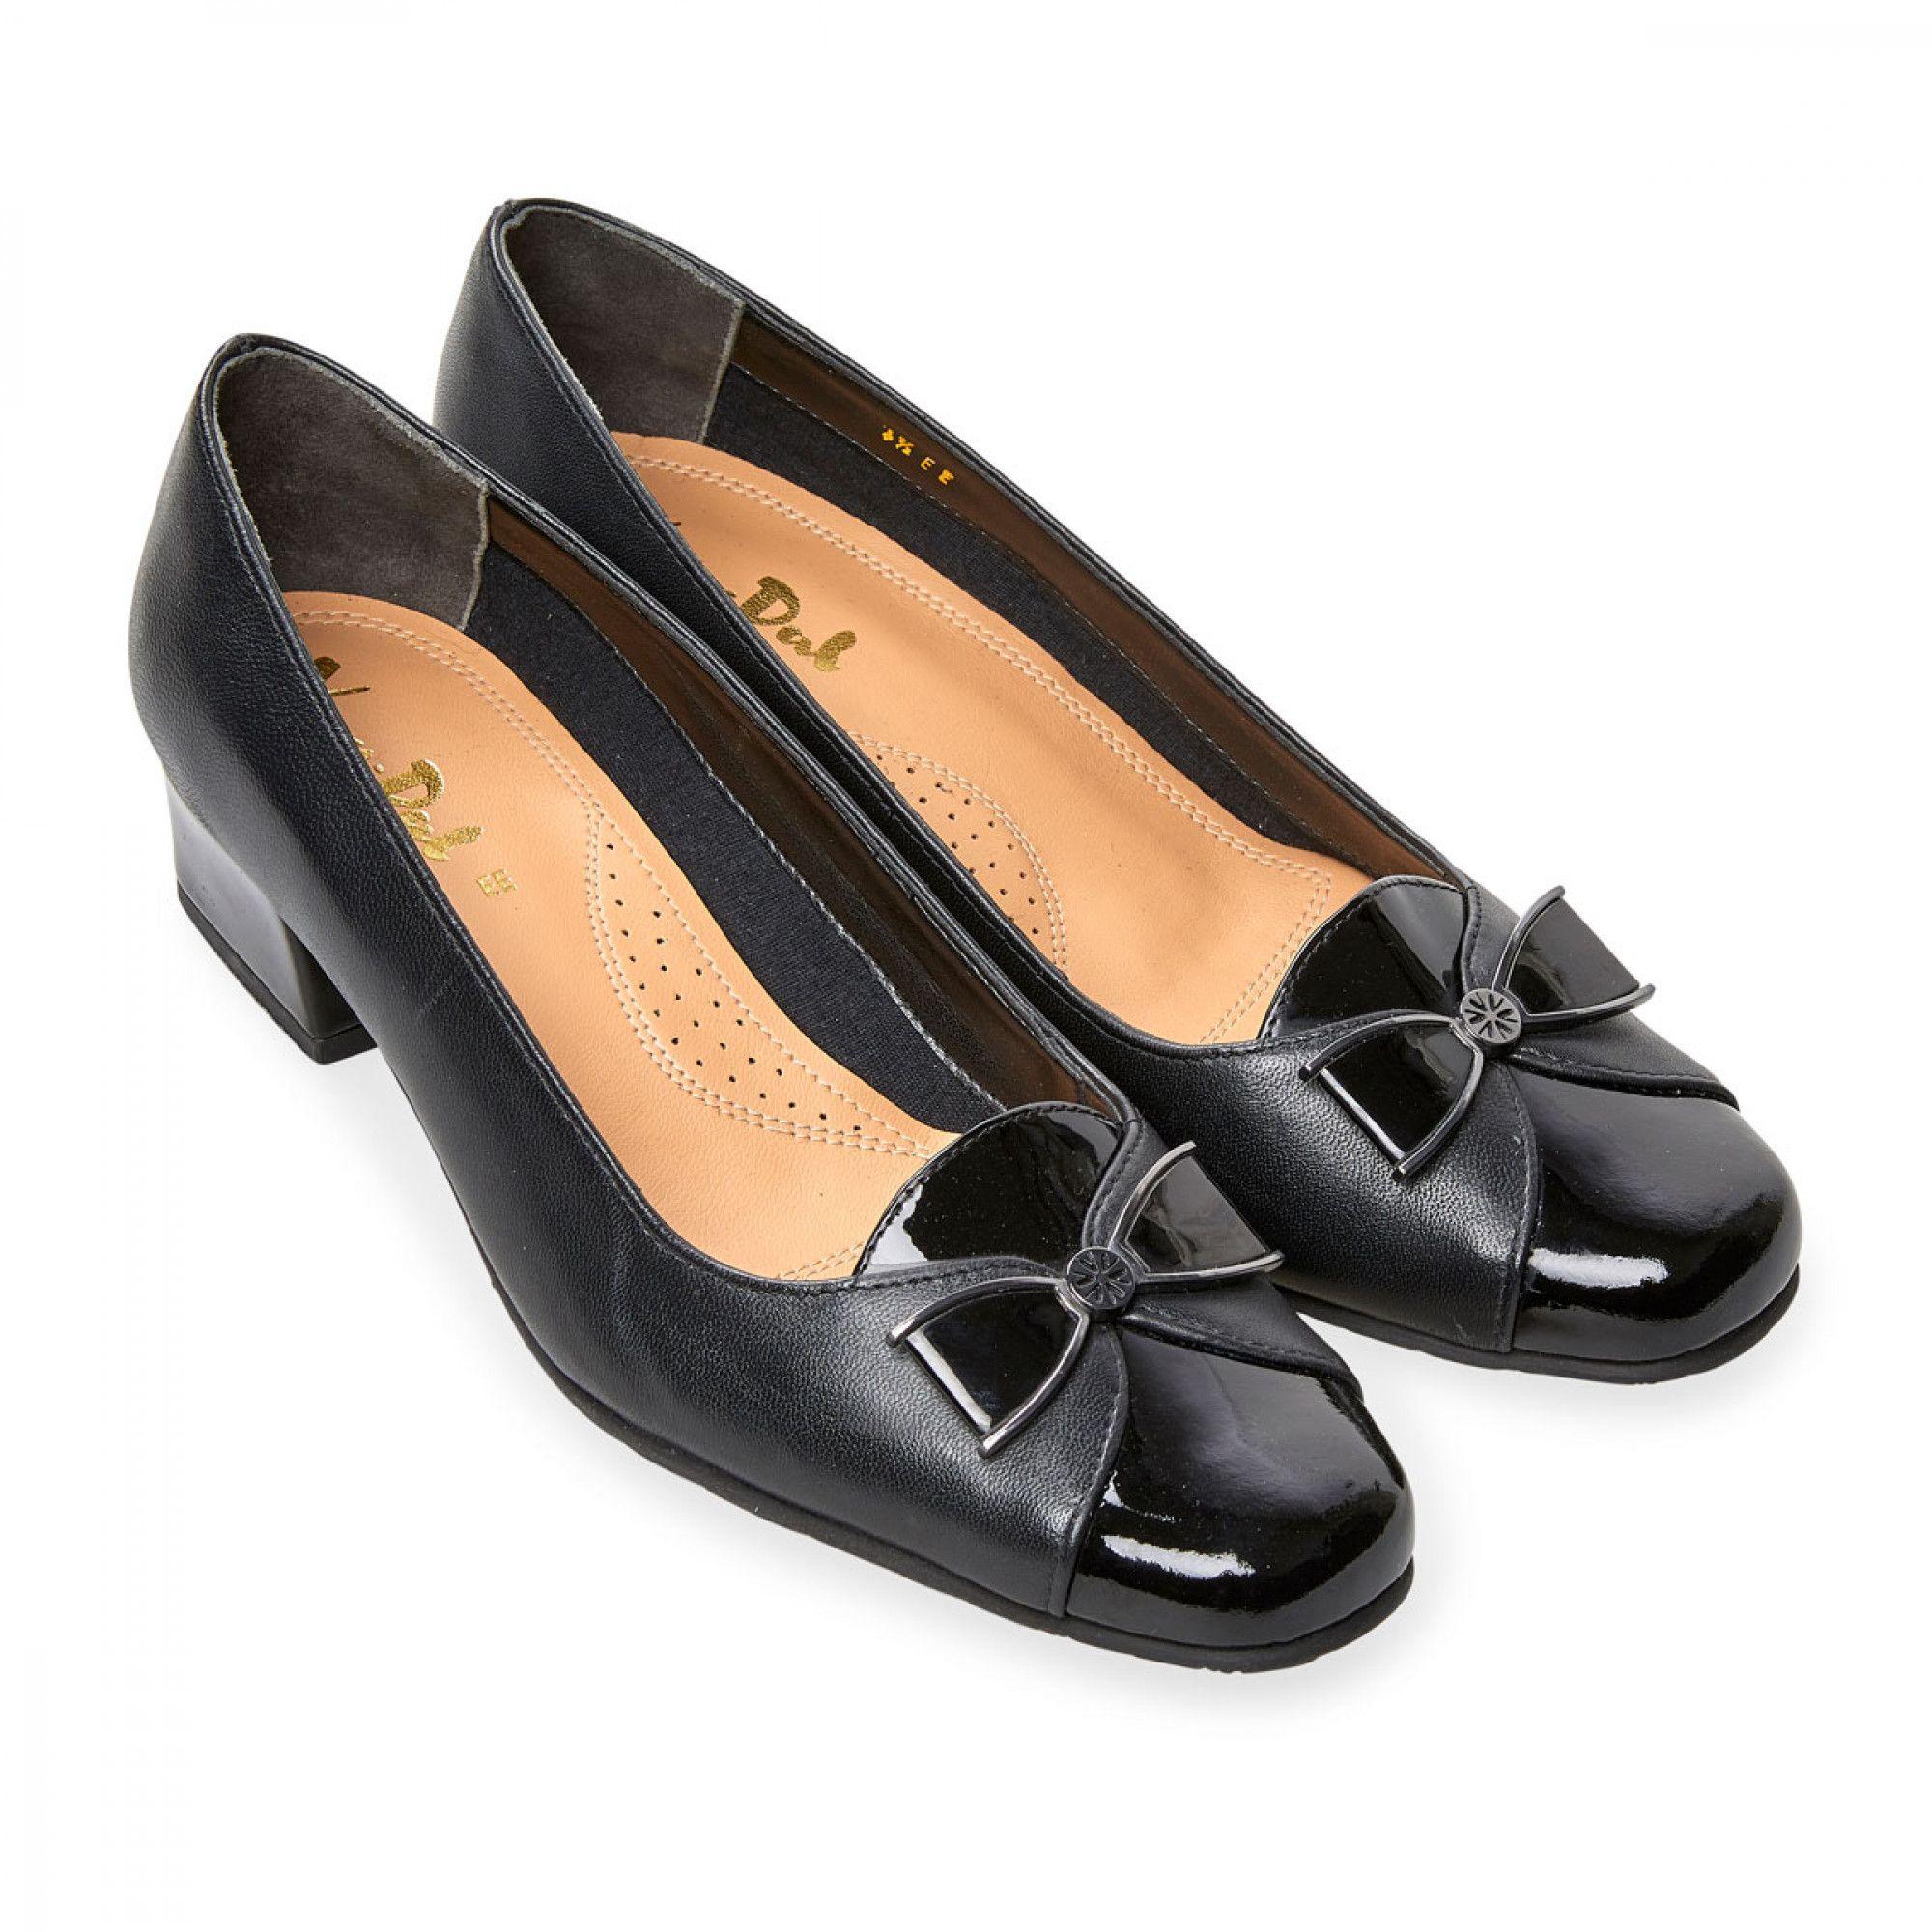 Van dal shoes, Leather heels, Black leather